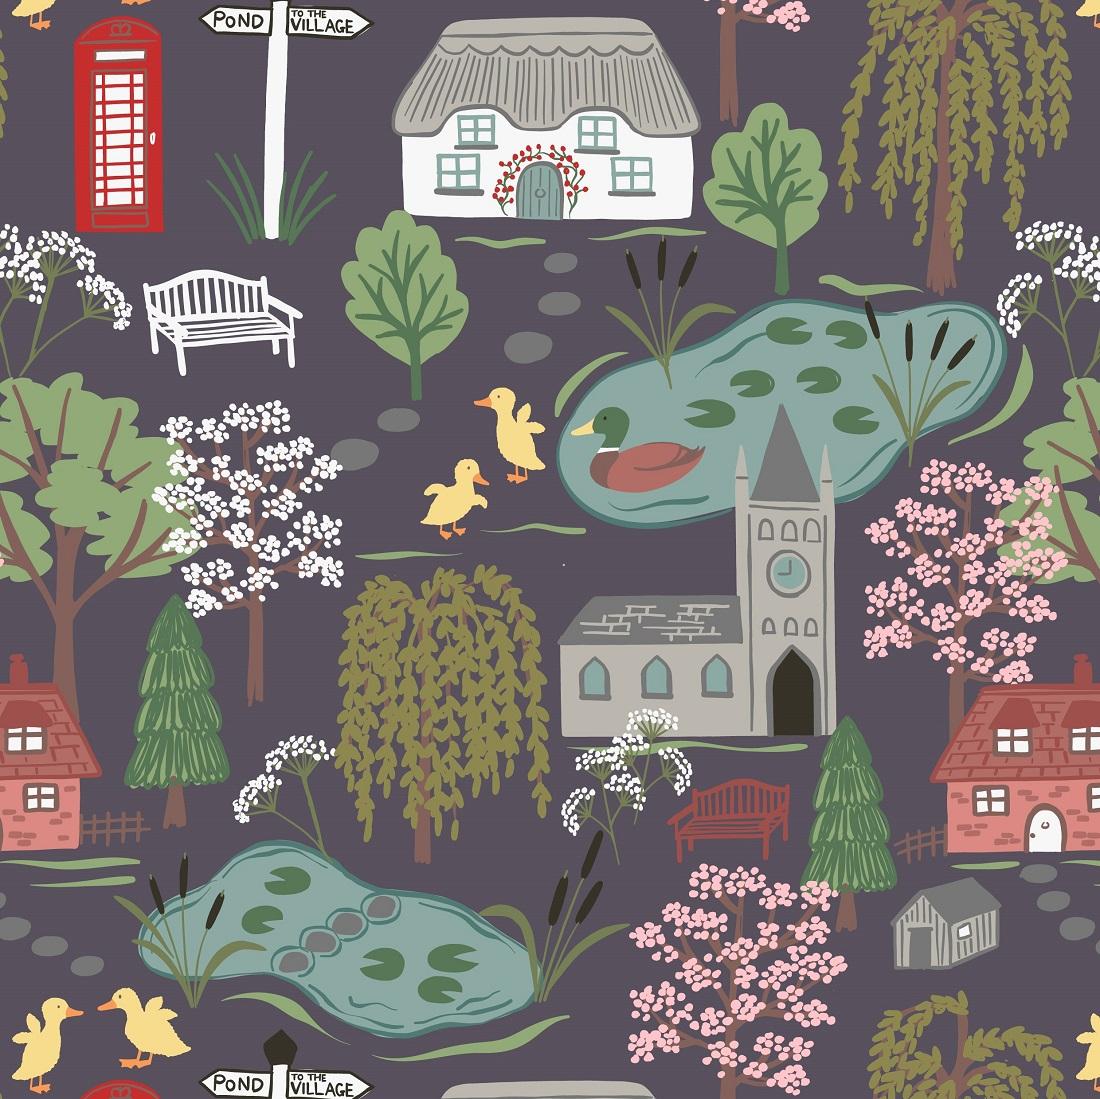 Village Pond Scene Aubergine Craft Fabric